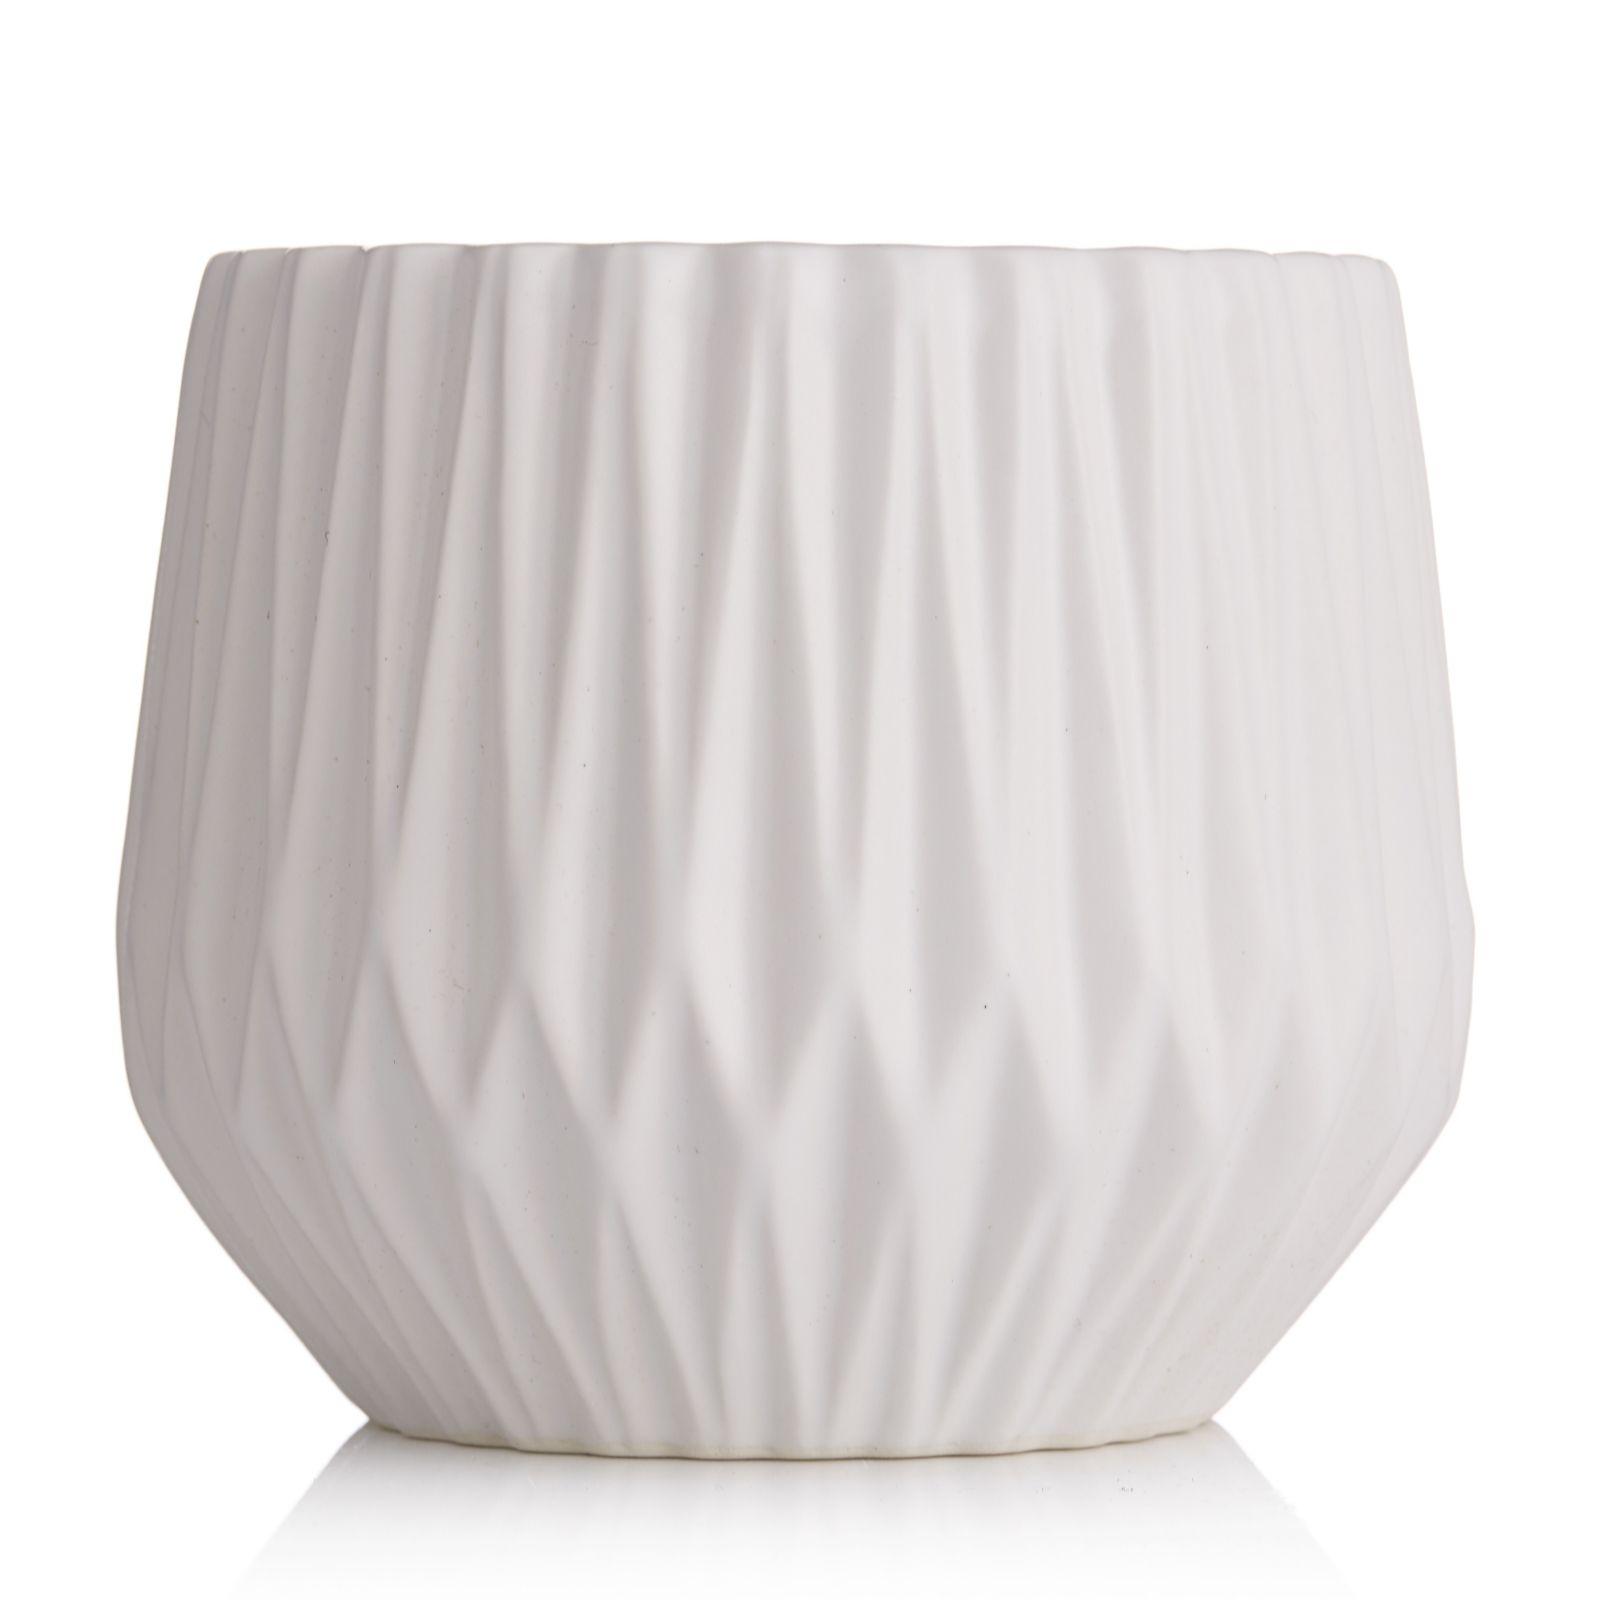 K by kelly hoppen vases home kitchen qvc uk k by kelly hoppen diamond ribbed vase 708133 reviewsmspy